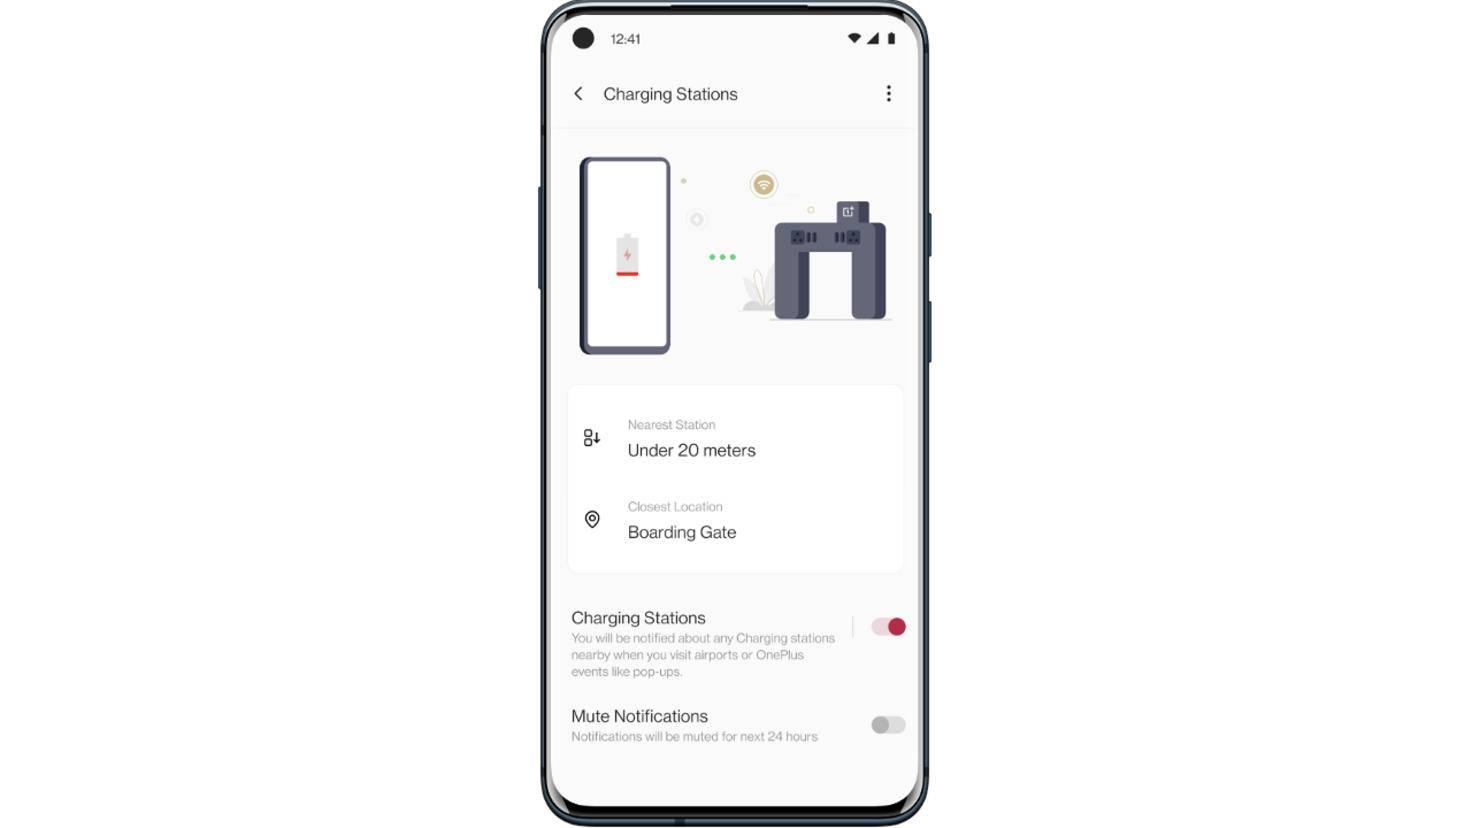 OnePlus-Airport-Charging